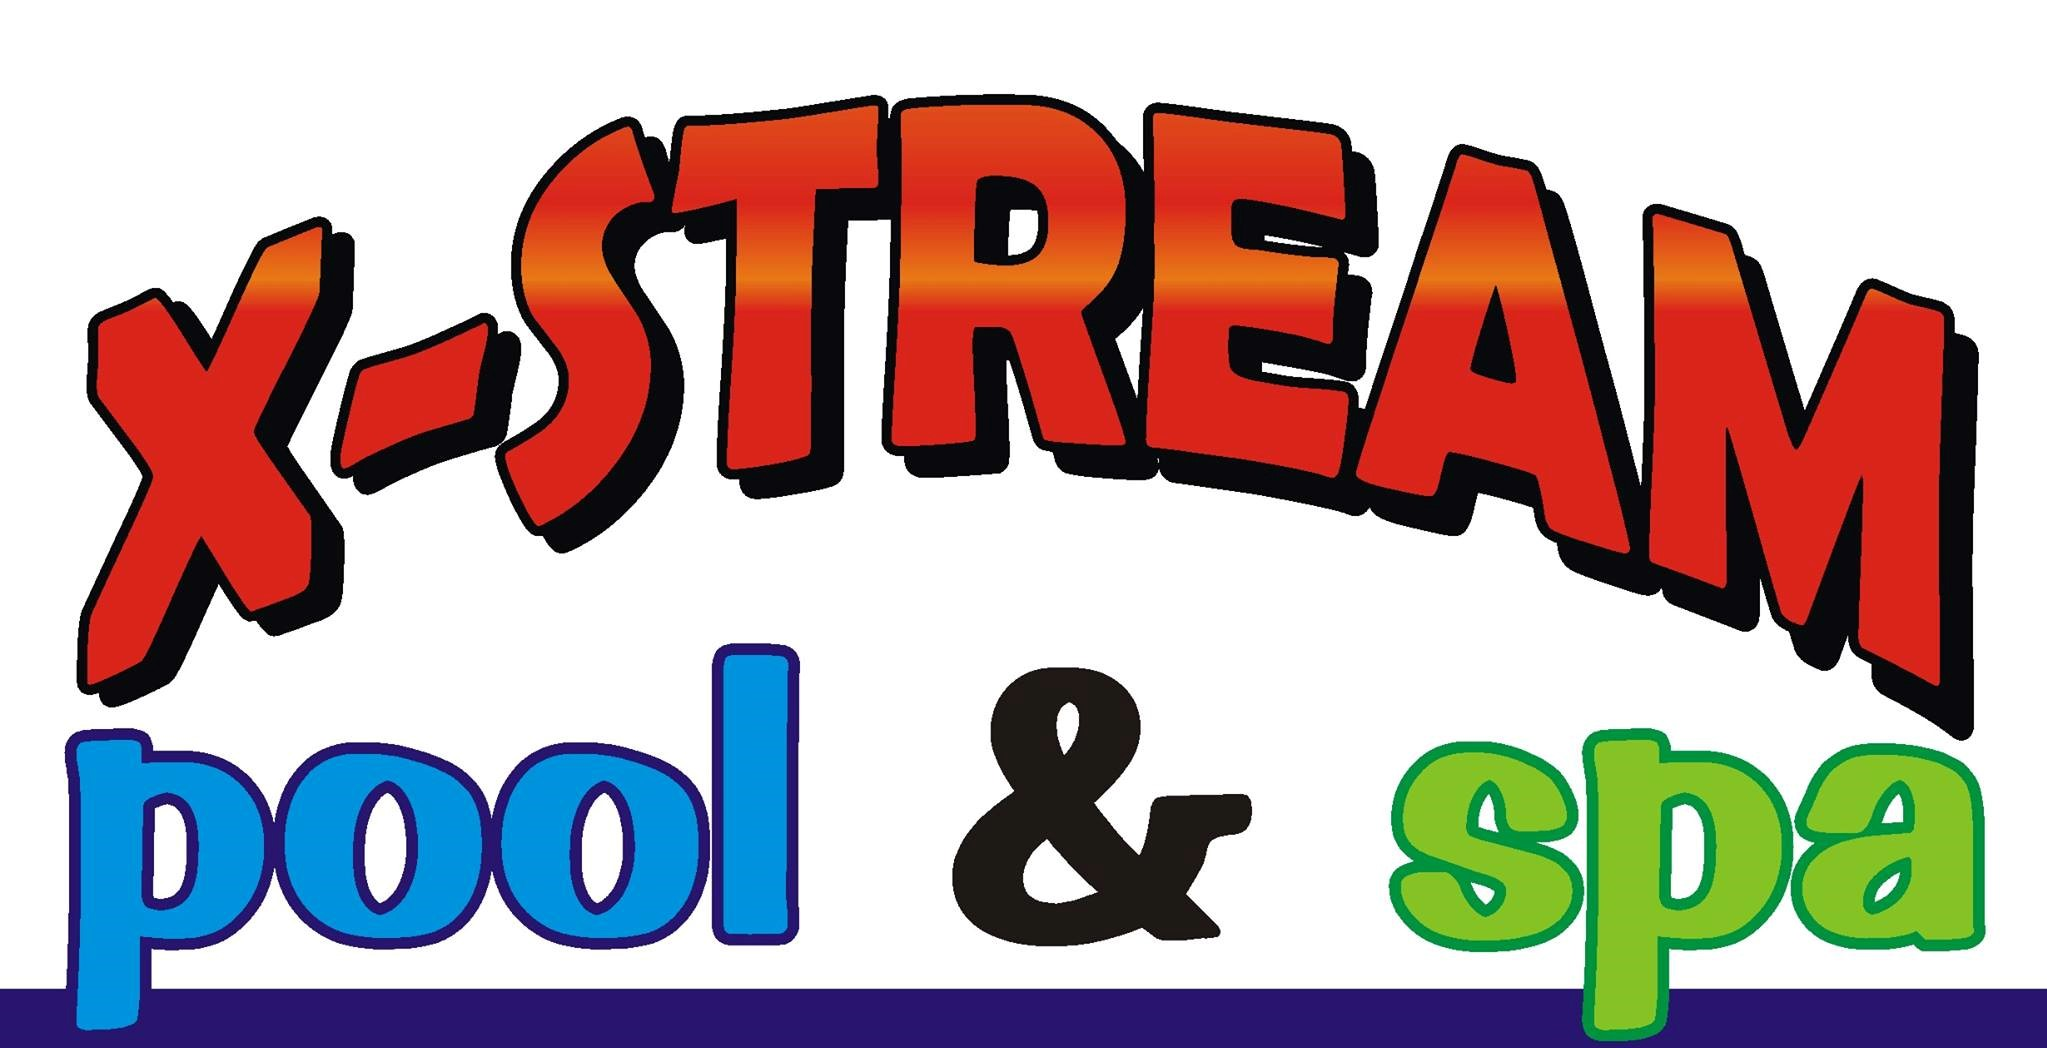 X-Stream Pool & Spa Profile Pic 2